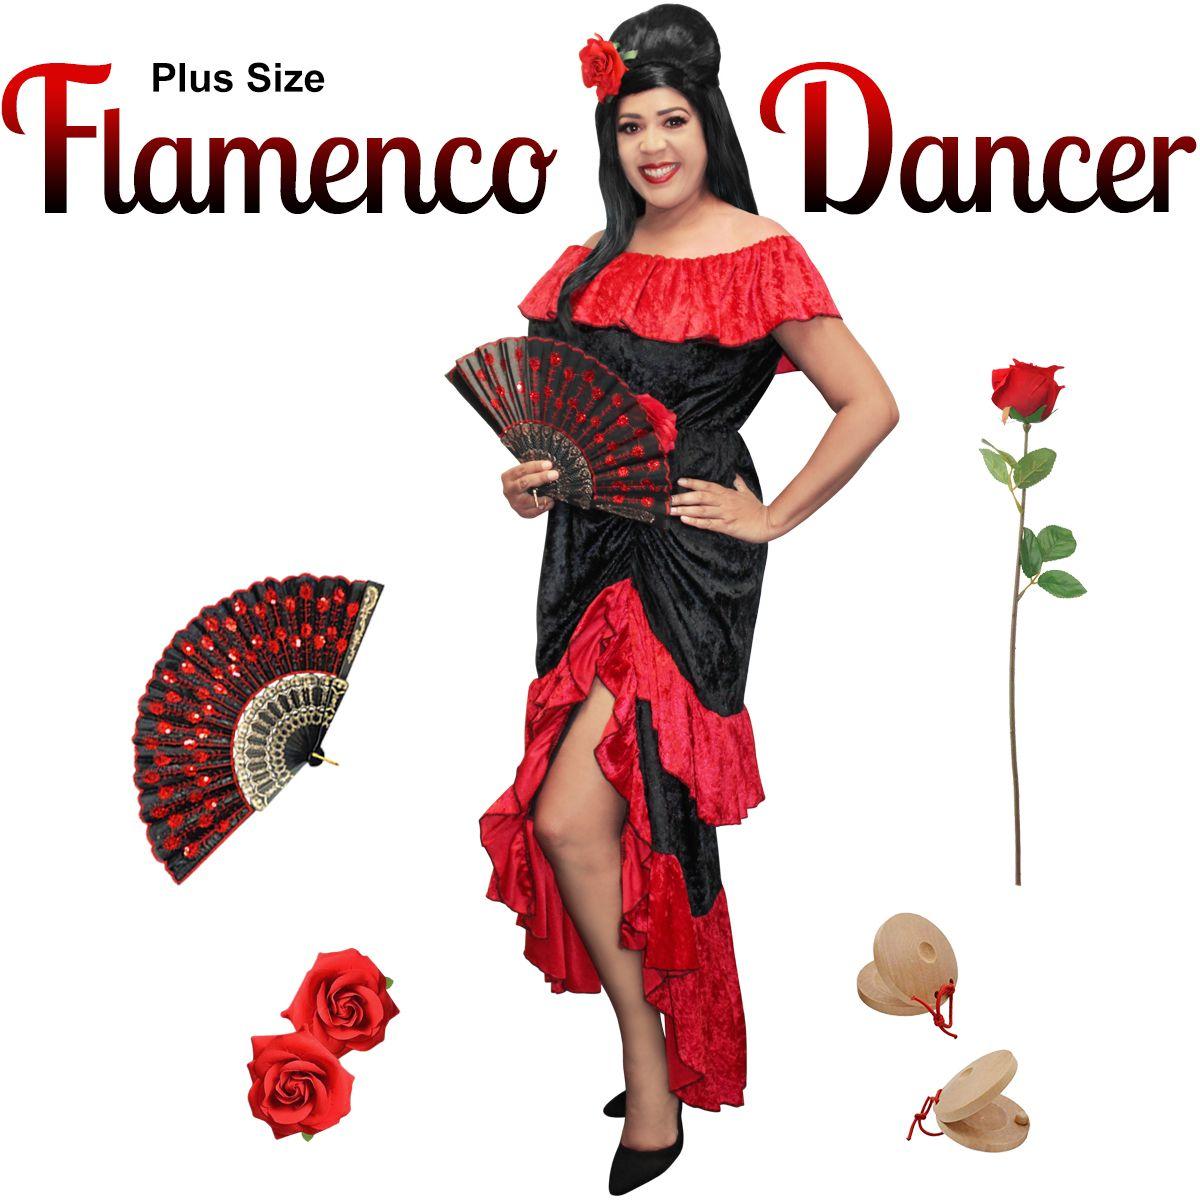 56089329eca6 NEW! Plus Size Flamenco Halloween Costume XL 1x 2x 3x 4x 5x 6x 7x 8x ...